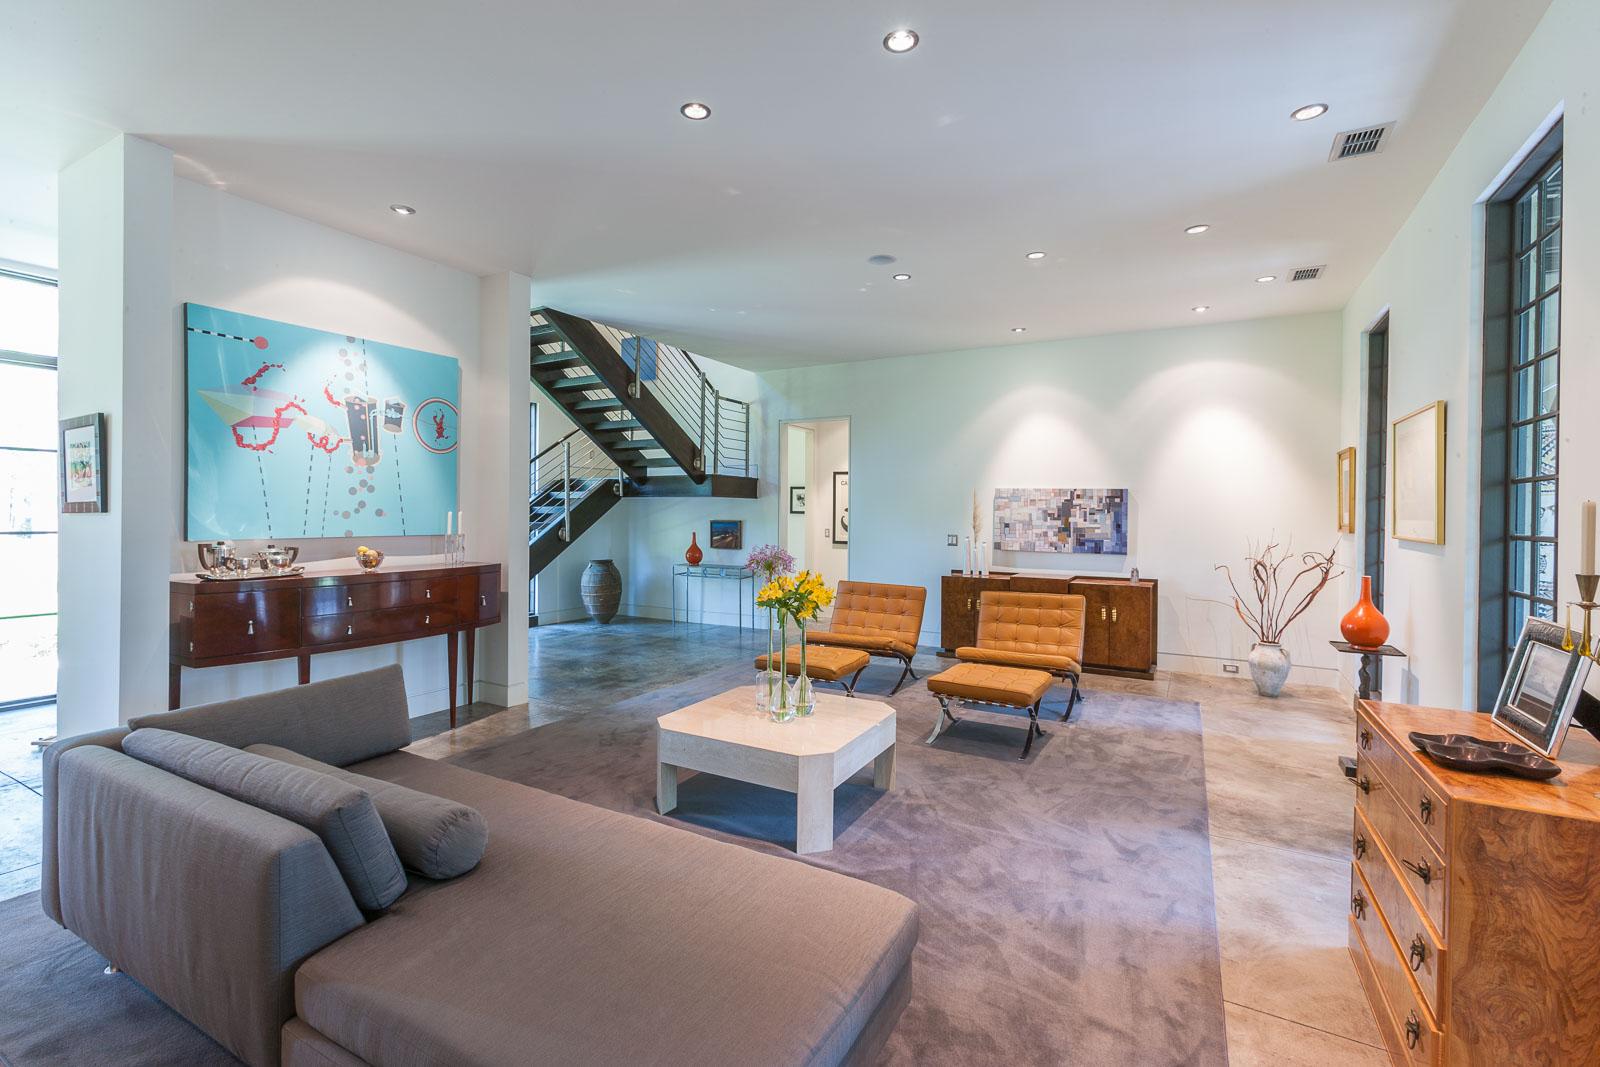 Interior Architecture photograph of living room Savannah, GA